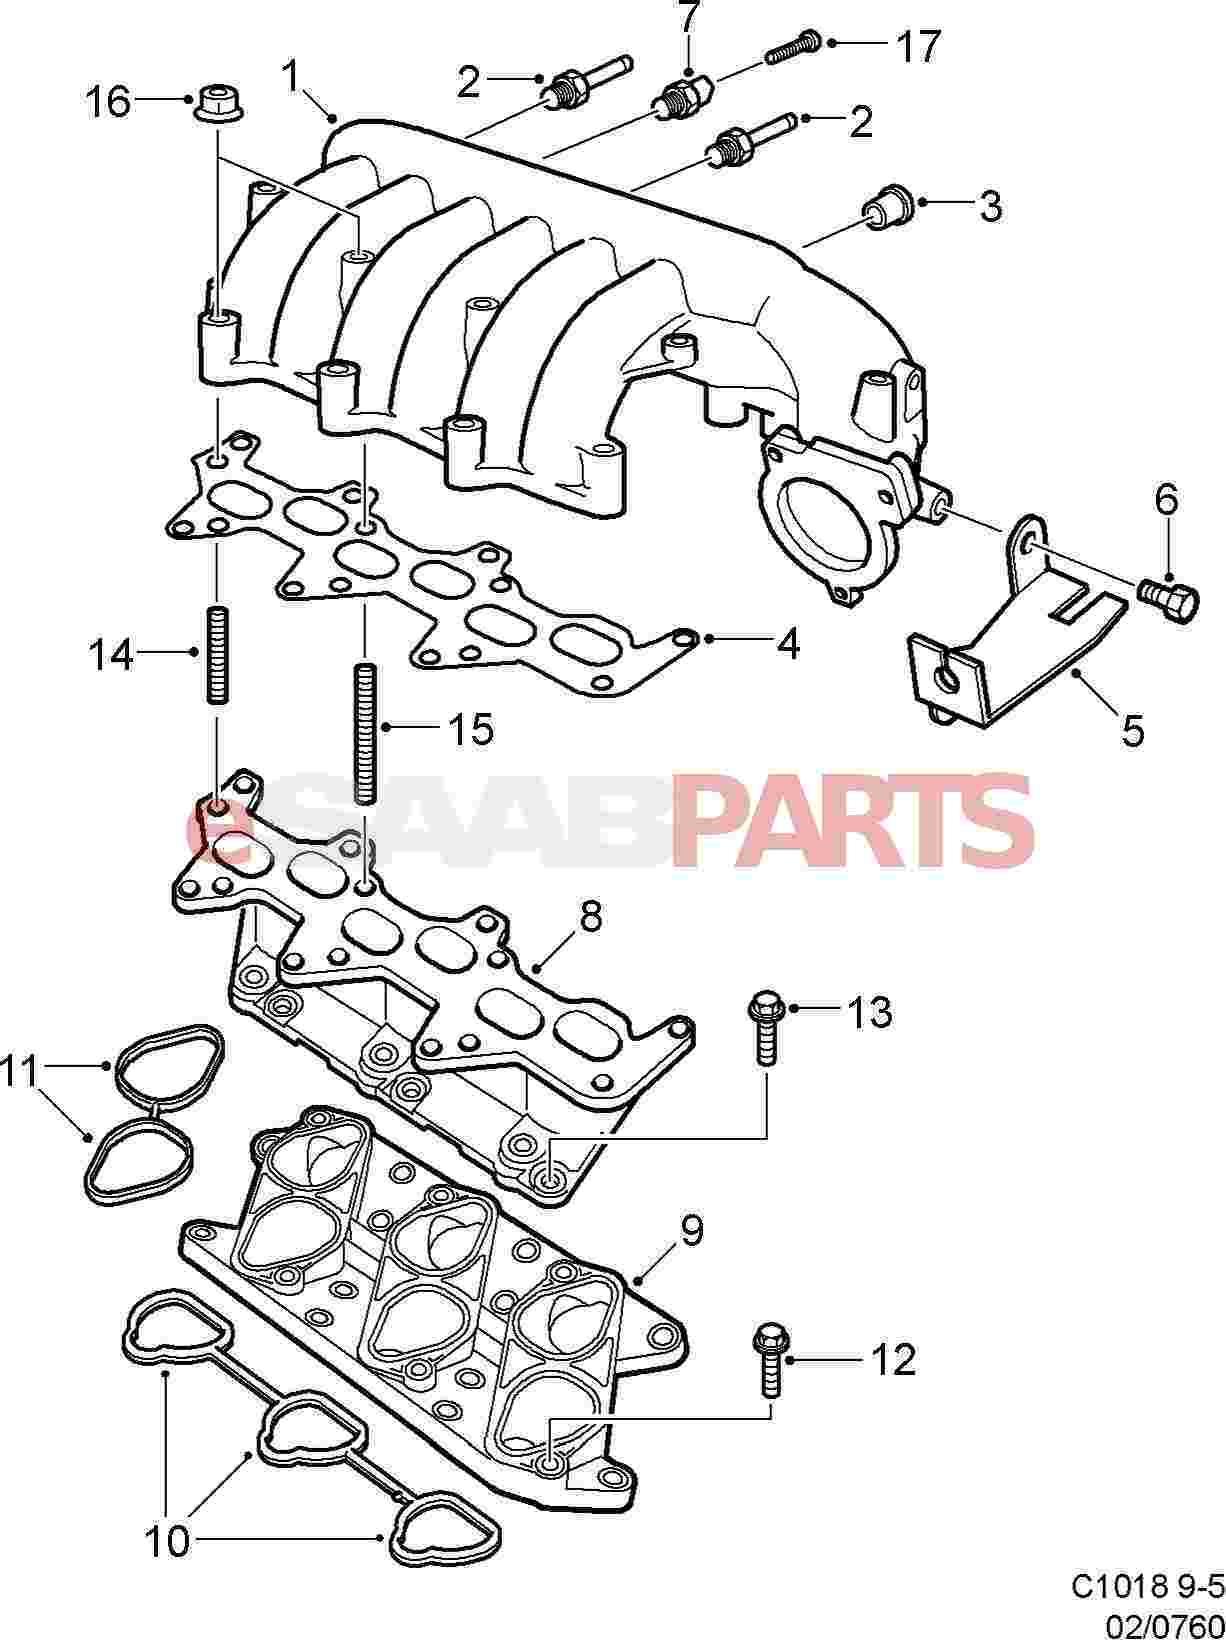 Saab Charge Air Absolute Pressure Sensor